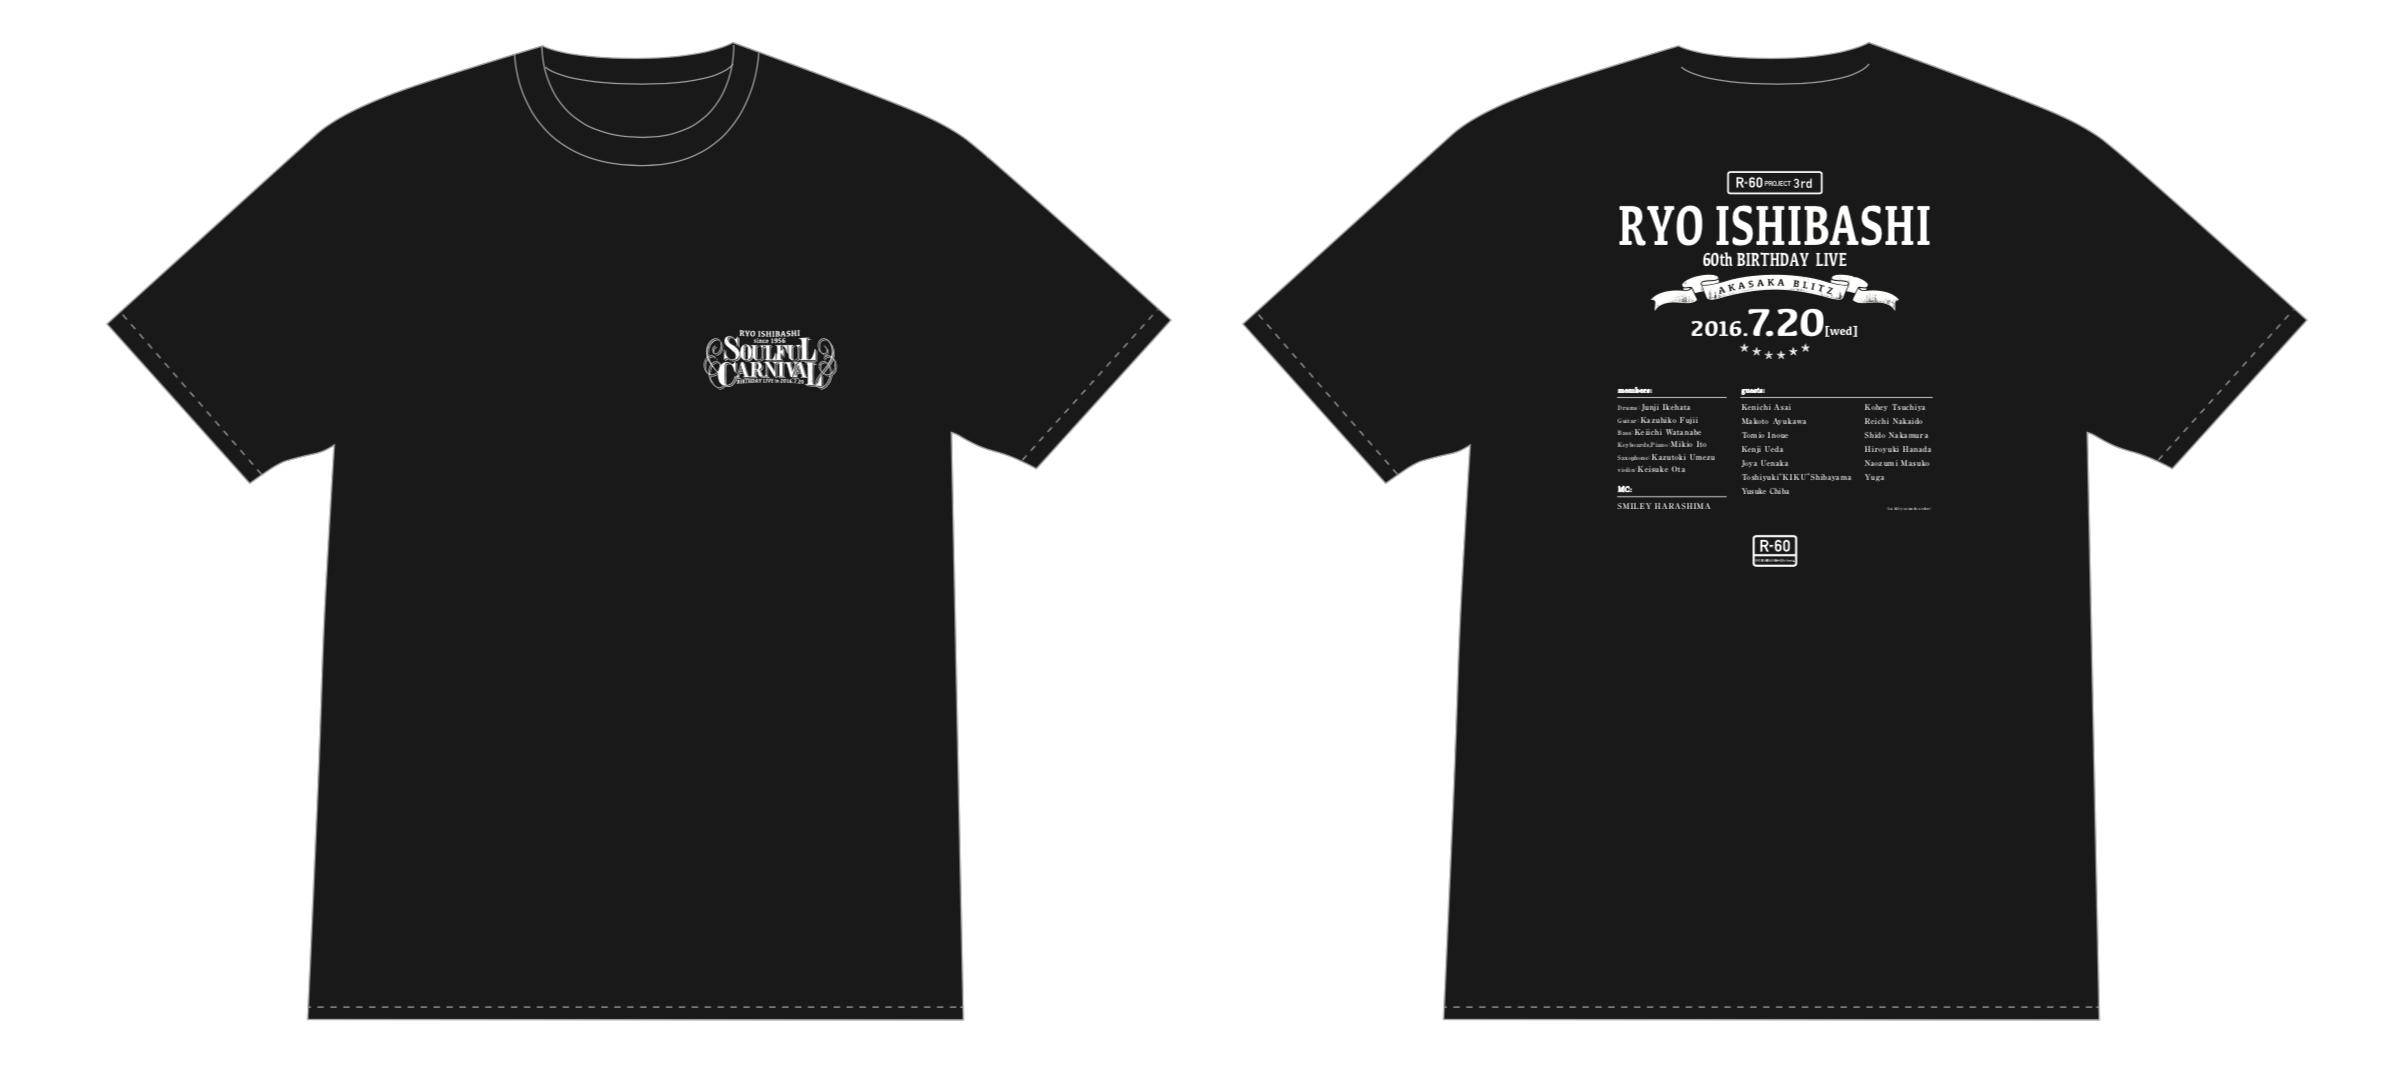 "BIRTHDAY LIVE ""SOULFUL CARNIVAL"" Tシャツ<ブラック>"